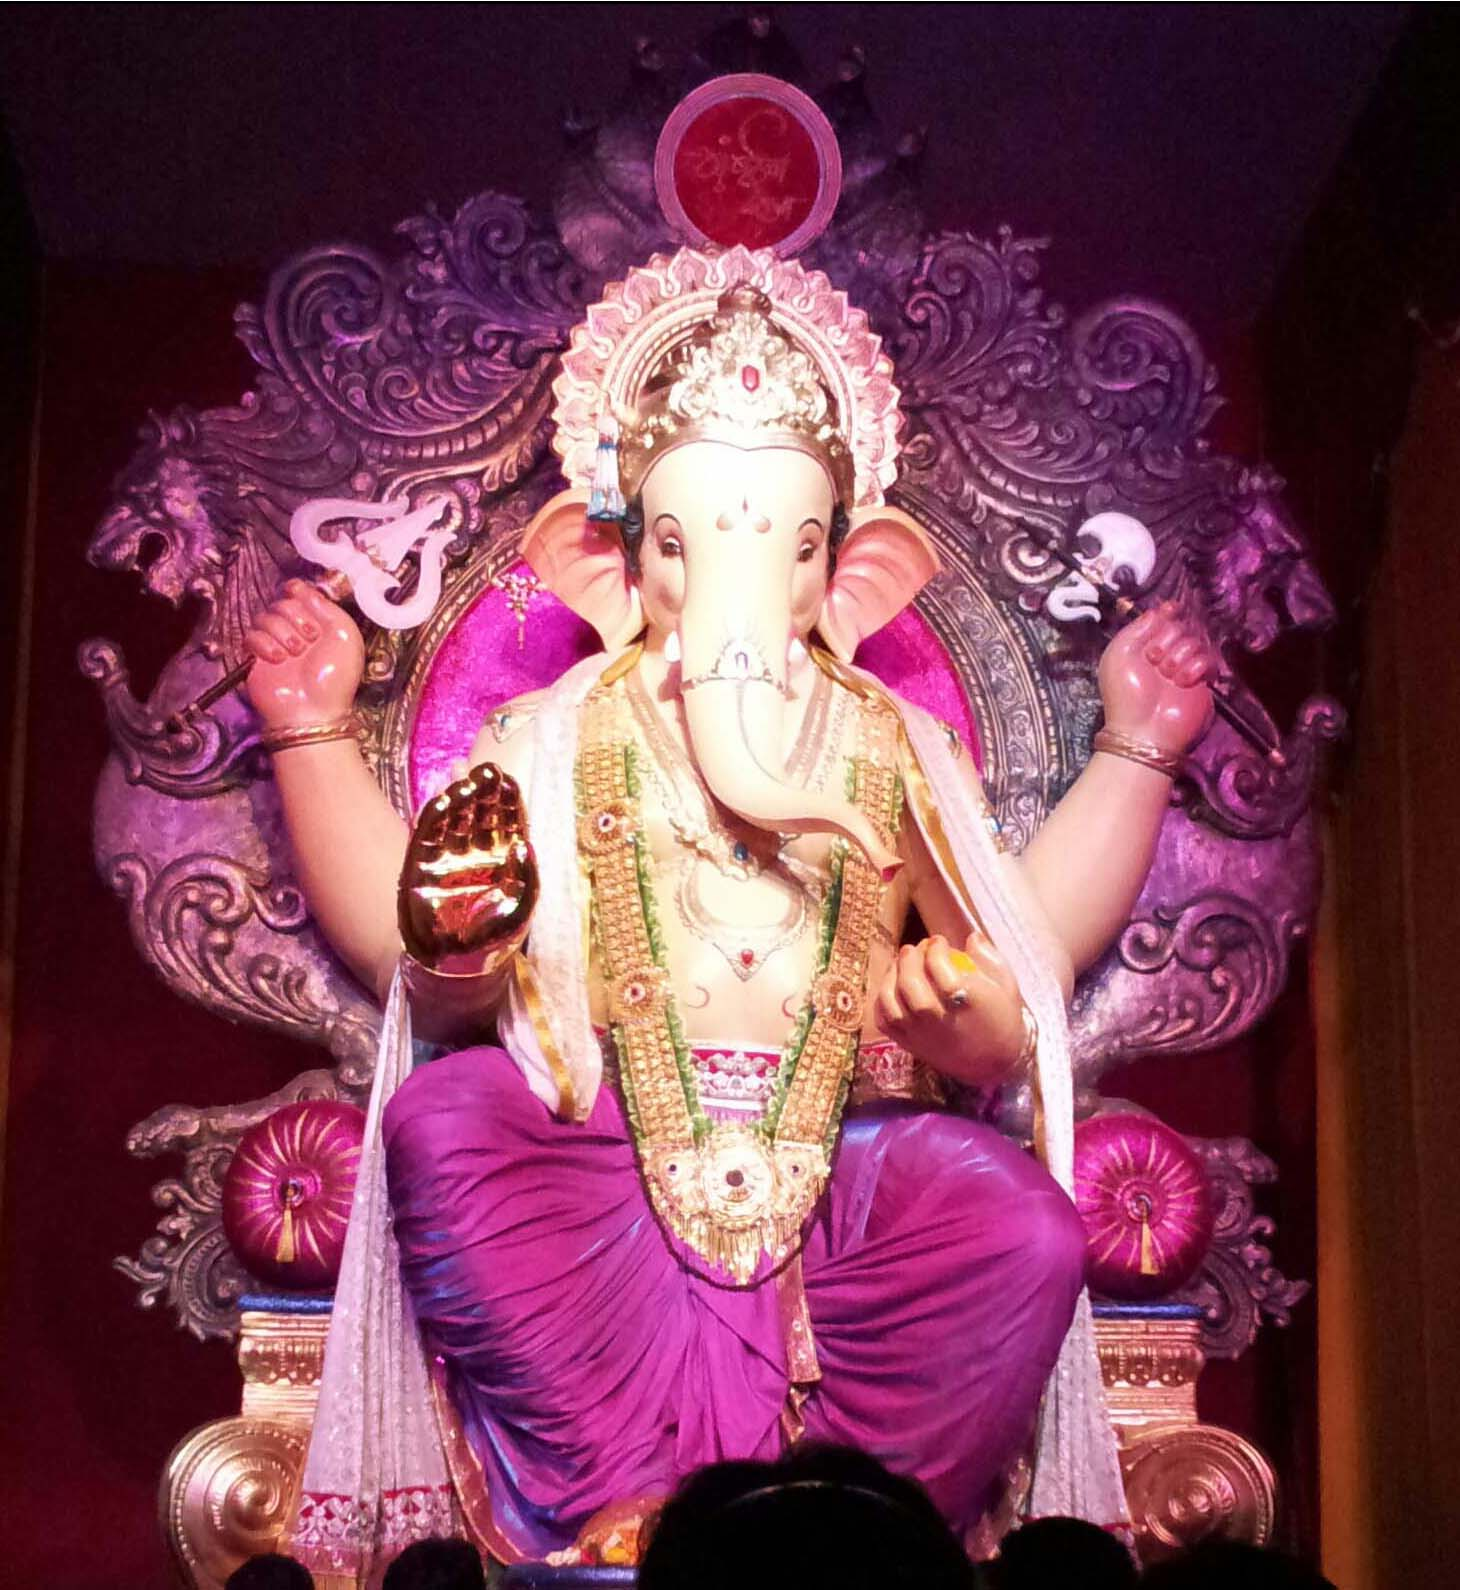 PARAFINATI CANDLES: Lord Ganesh & Lord Shiva Blessing